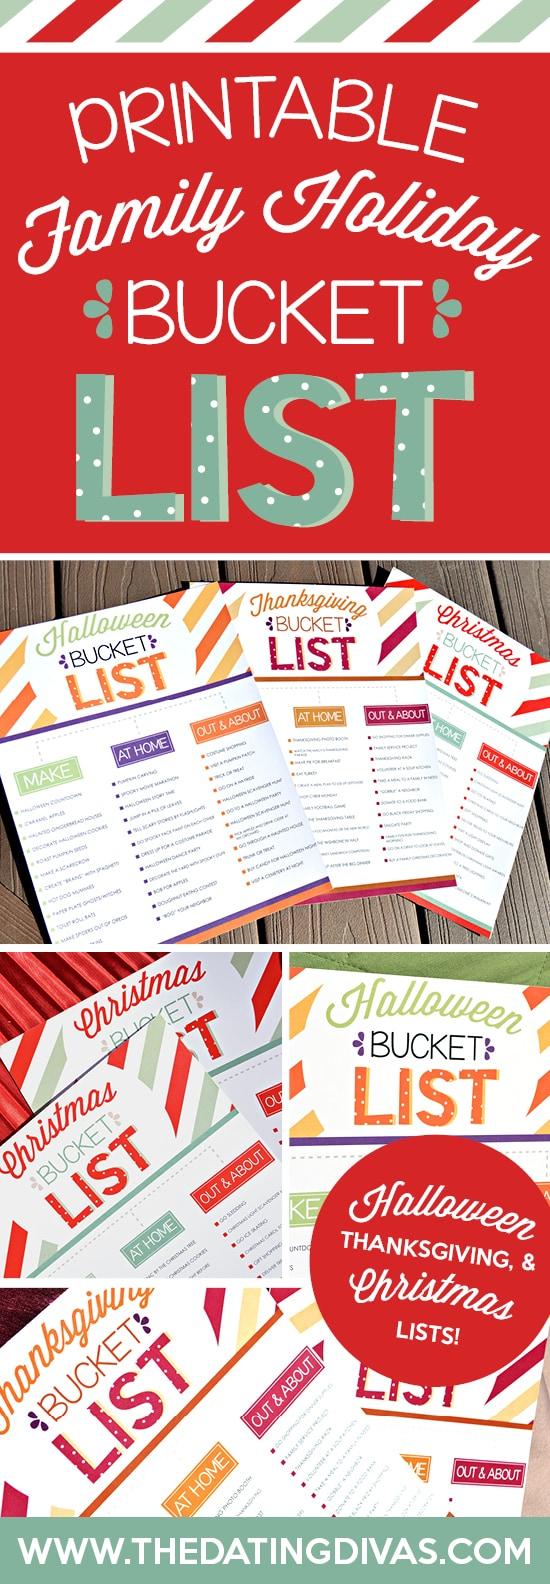 Free Printable Holiday Bucket Lists for Halloween, Thanksgiving, and Christmas!